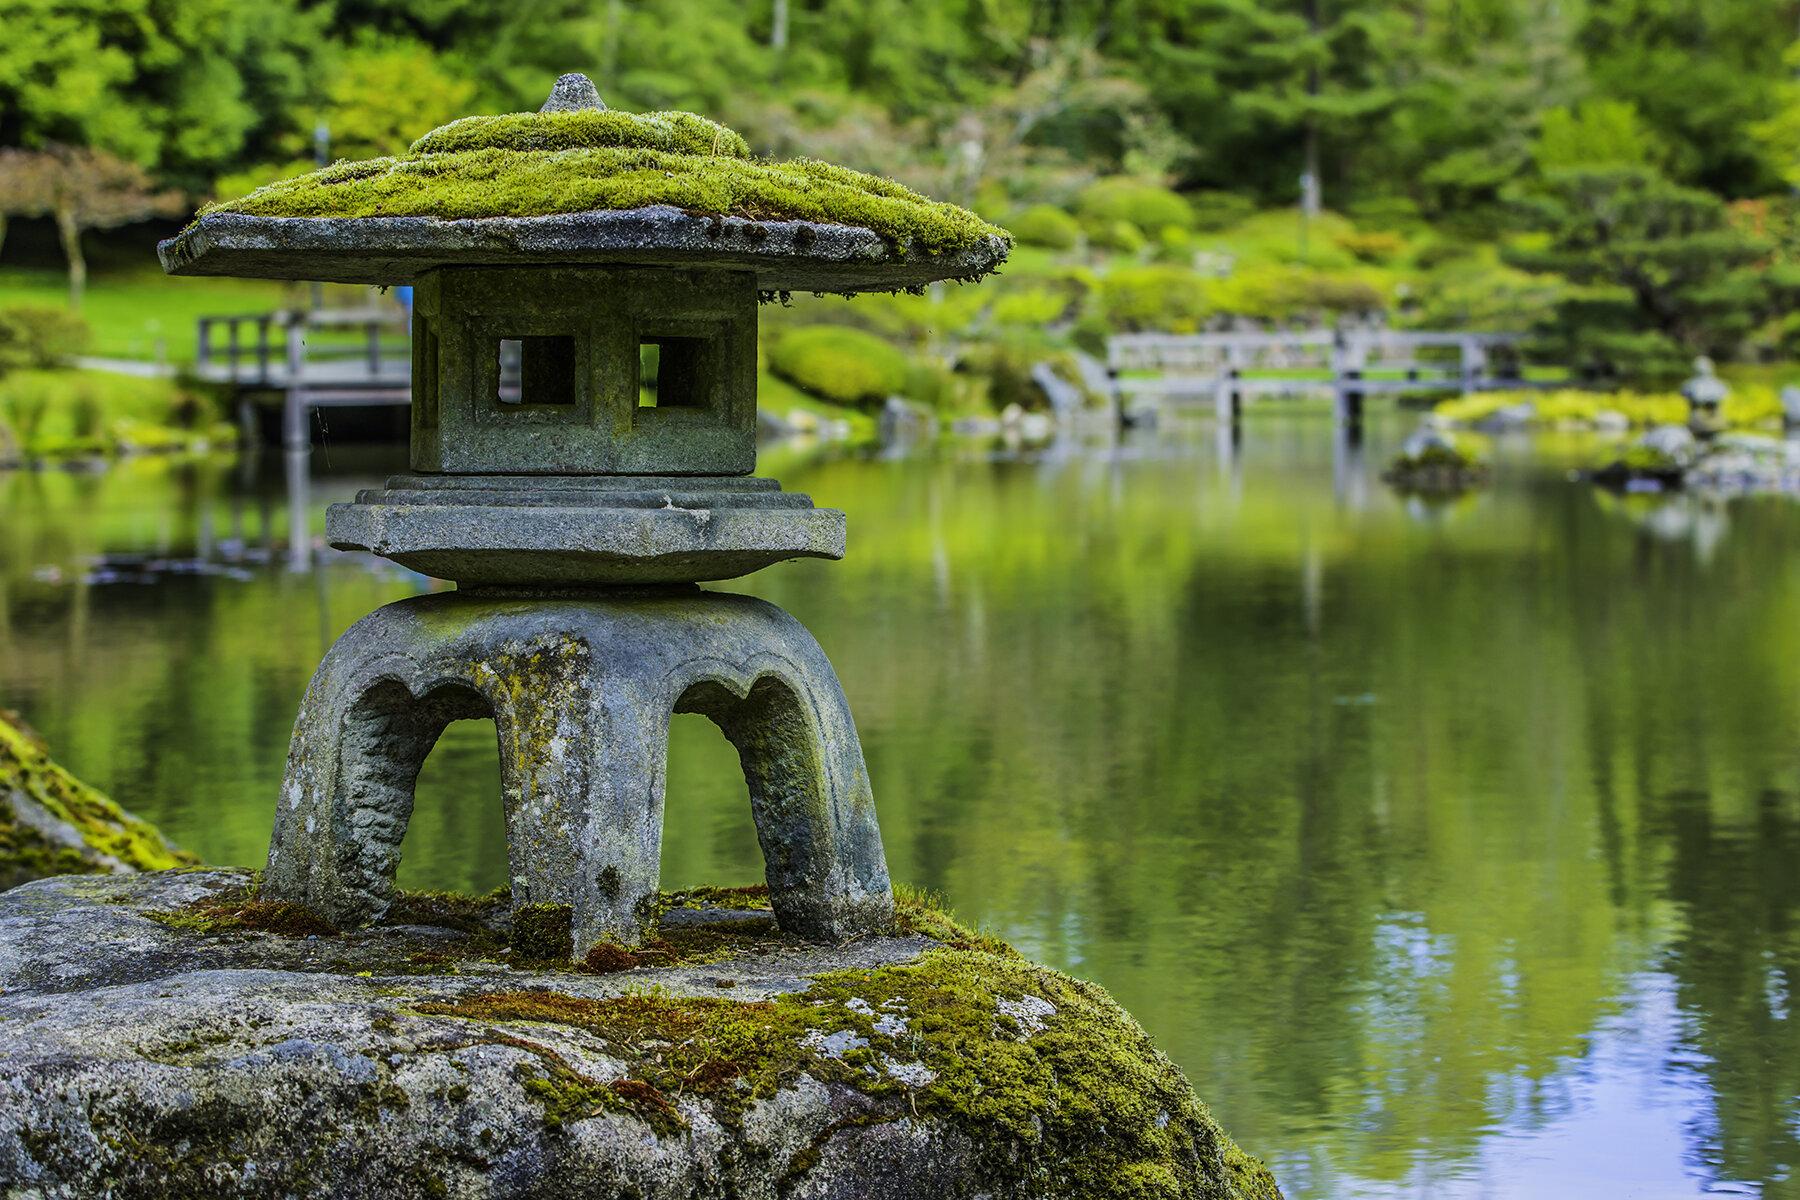 One of the garden's stone lanterns, covered in moss. (photo: David Rosen/SlickPix Photography)